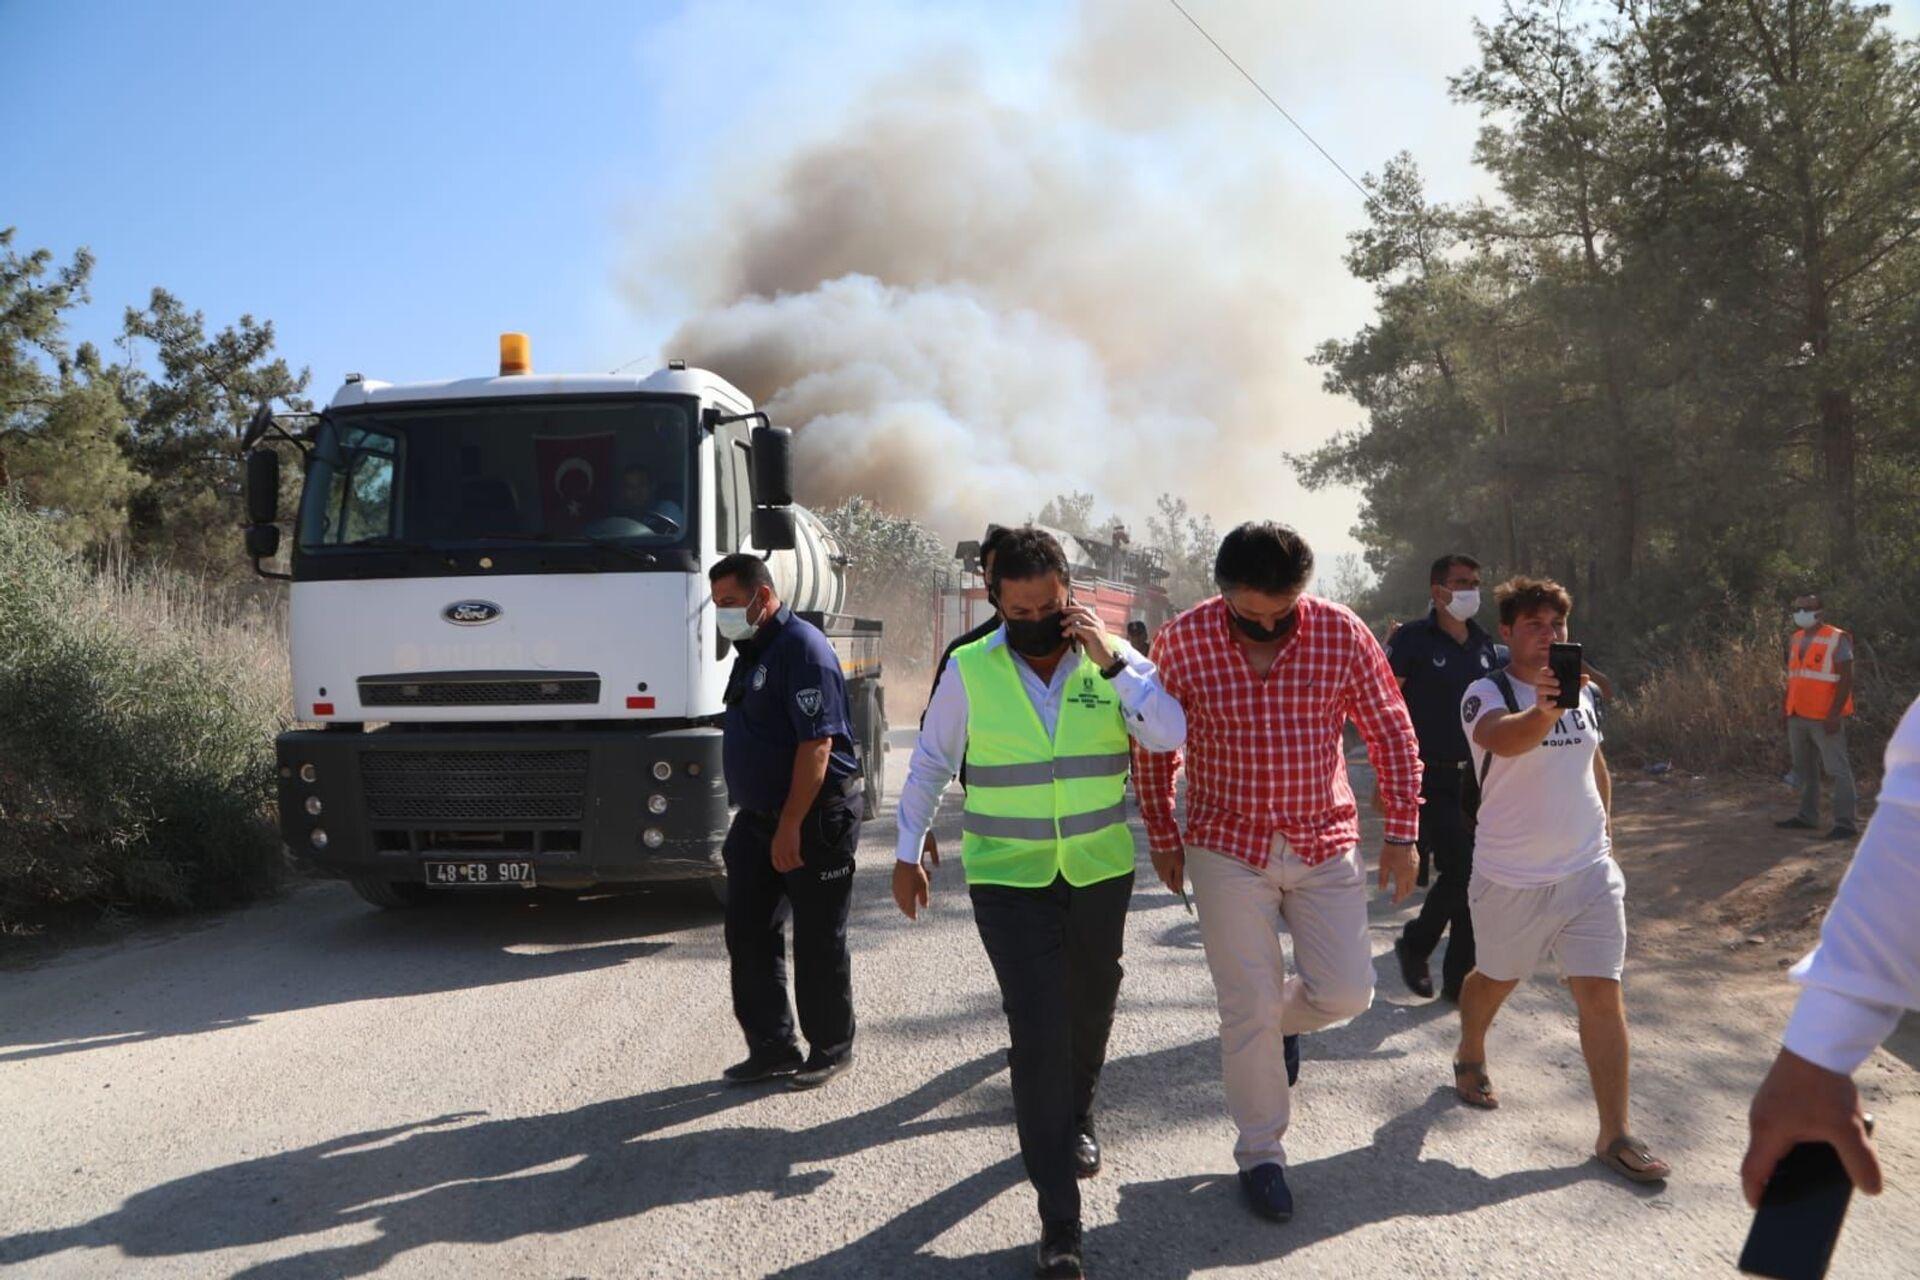 wildfire in the Turkish city of Bodrum - Sputnik International, 1920, 07.09.2021